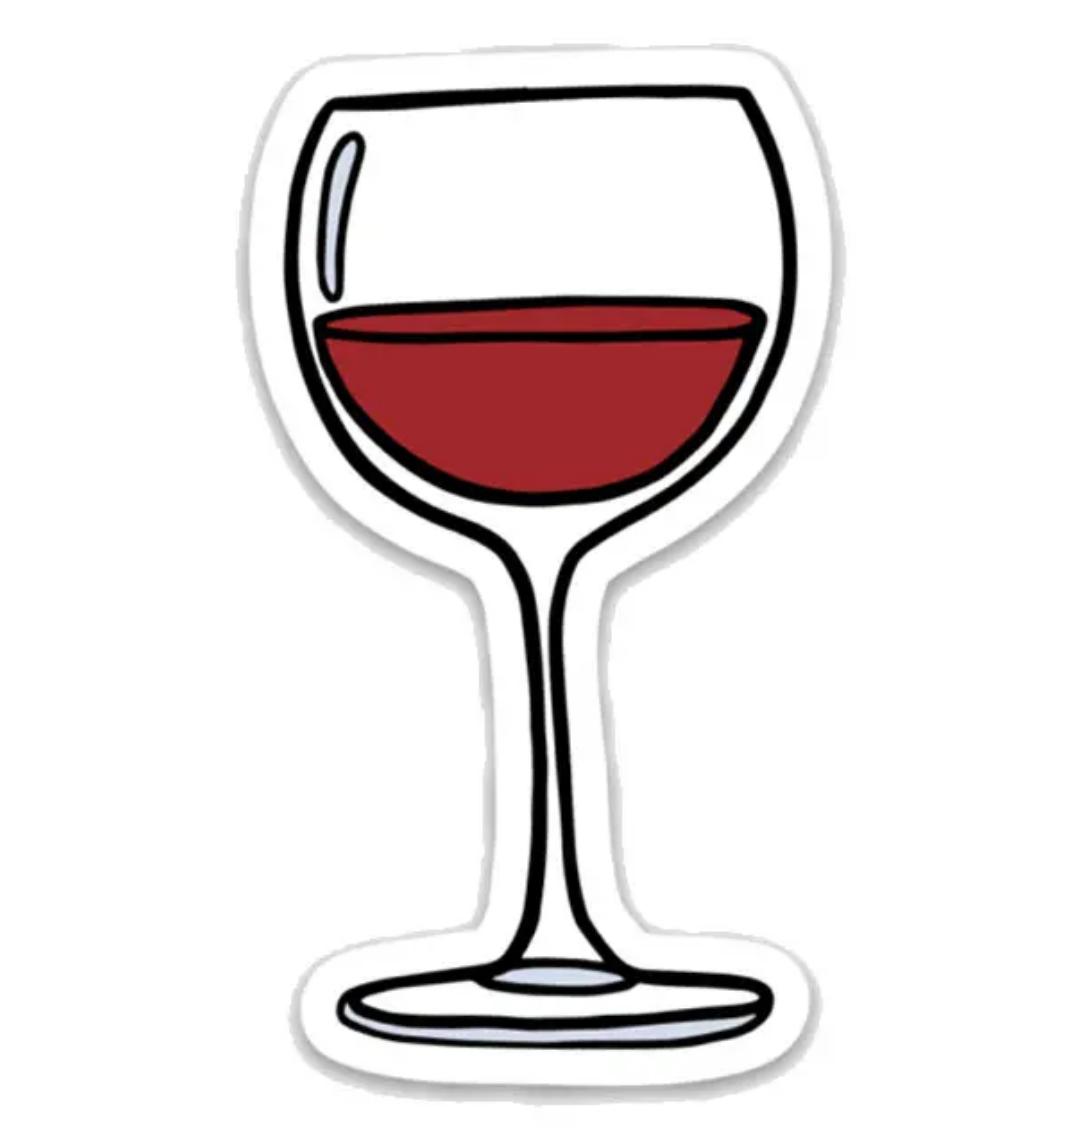 Brittany Paige Wine Glass Sticker